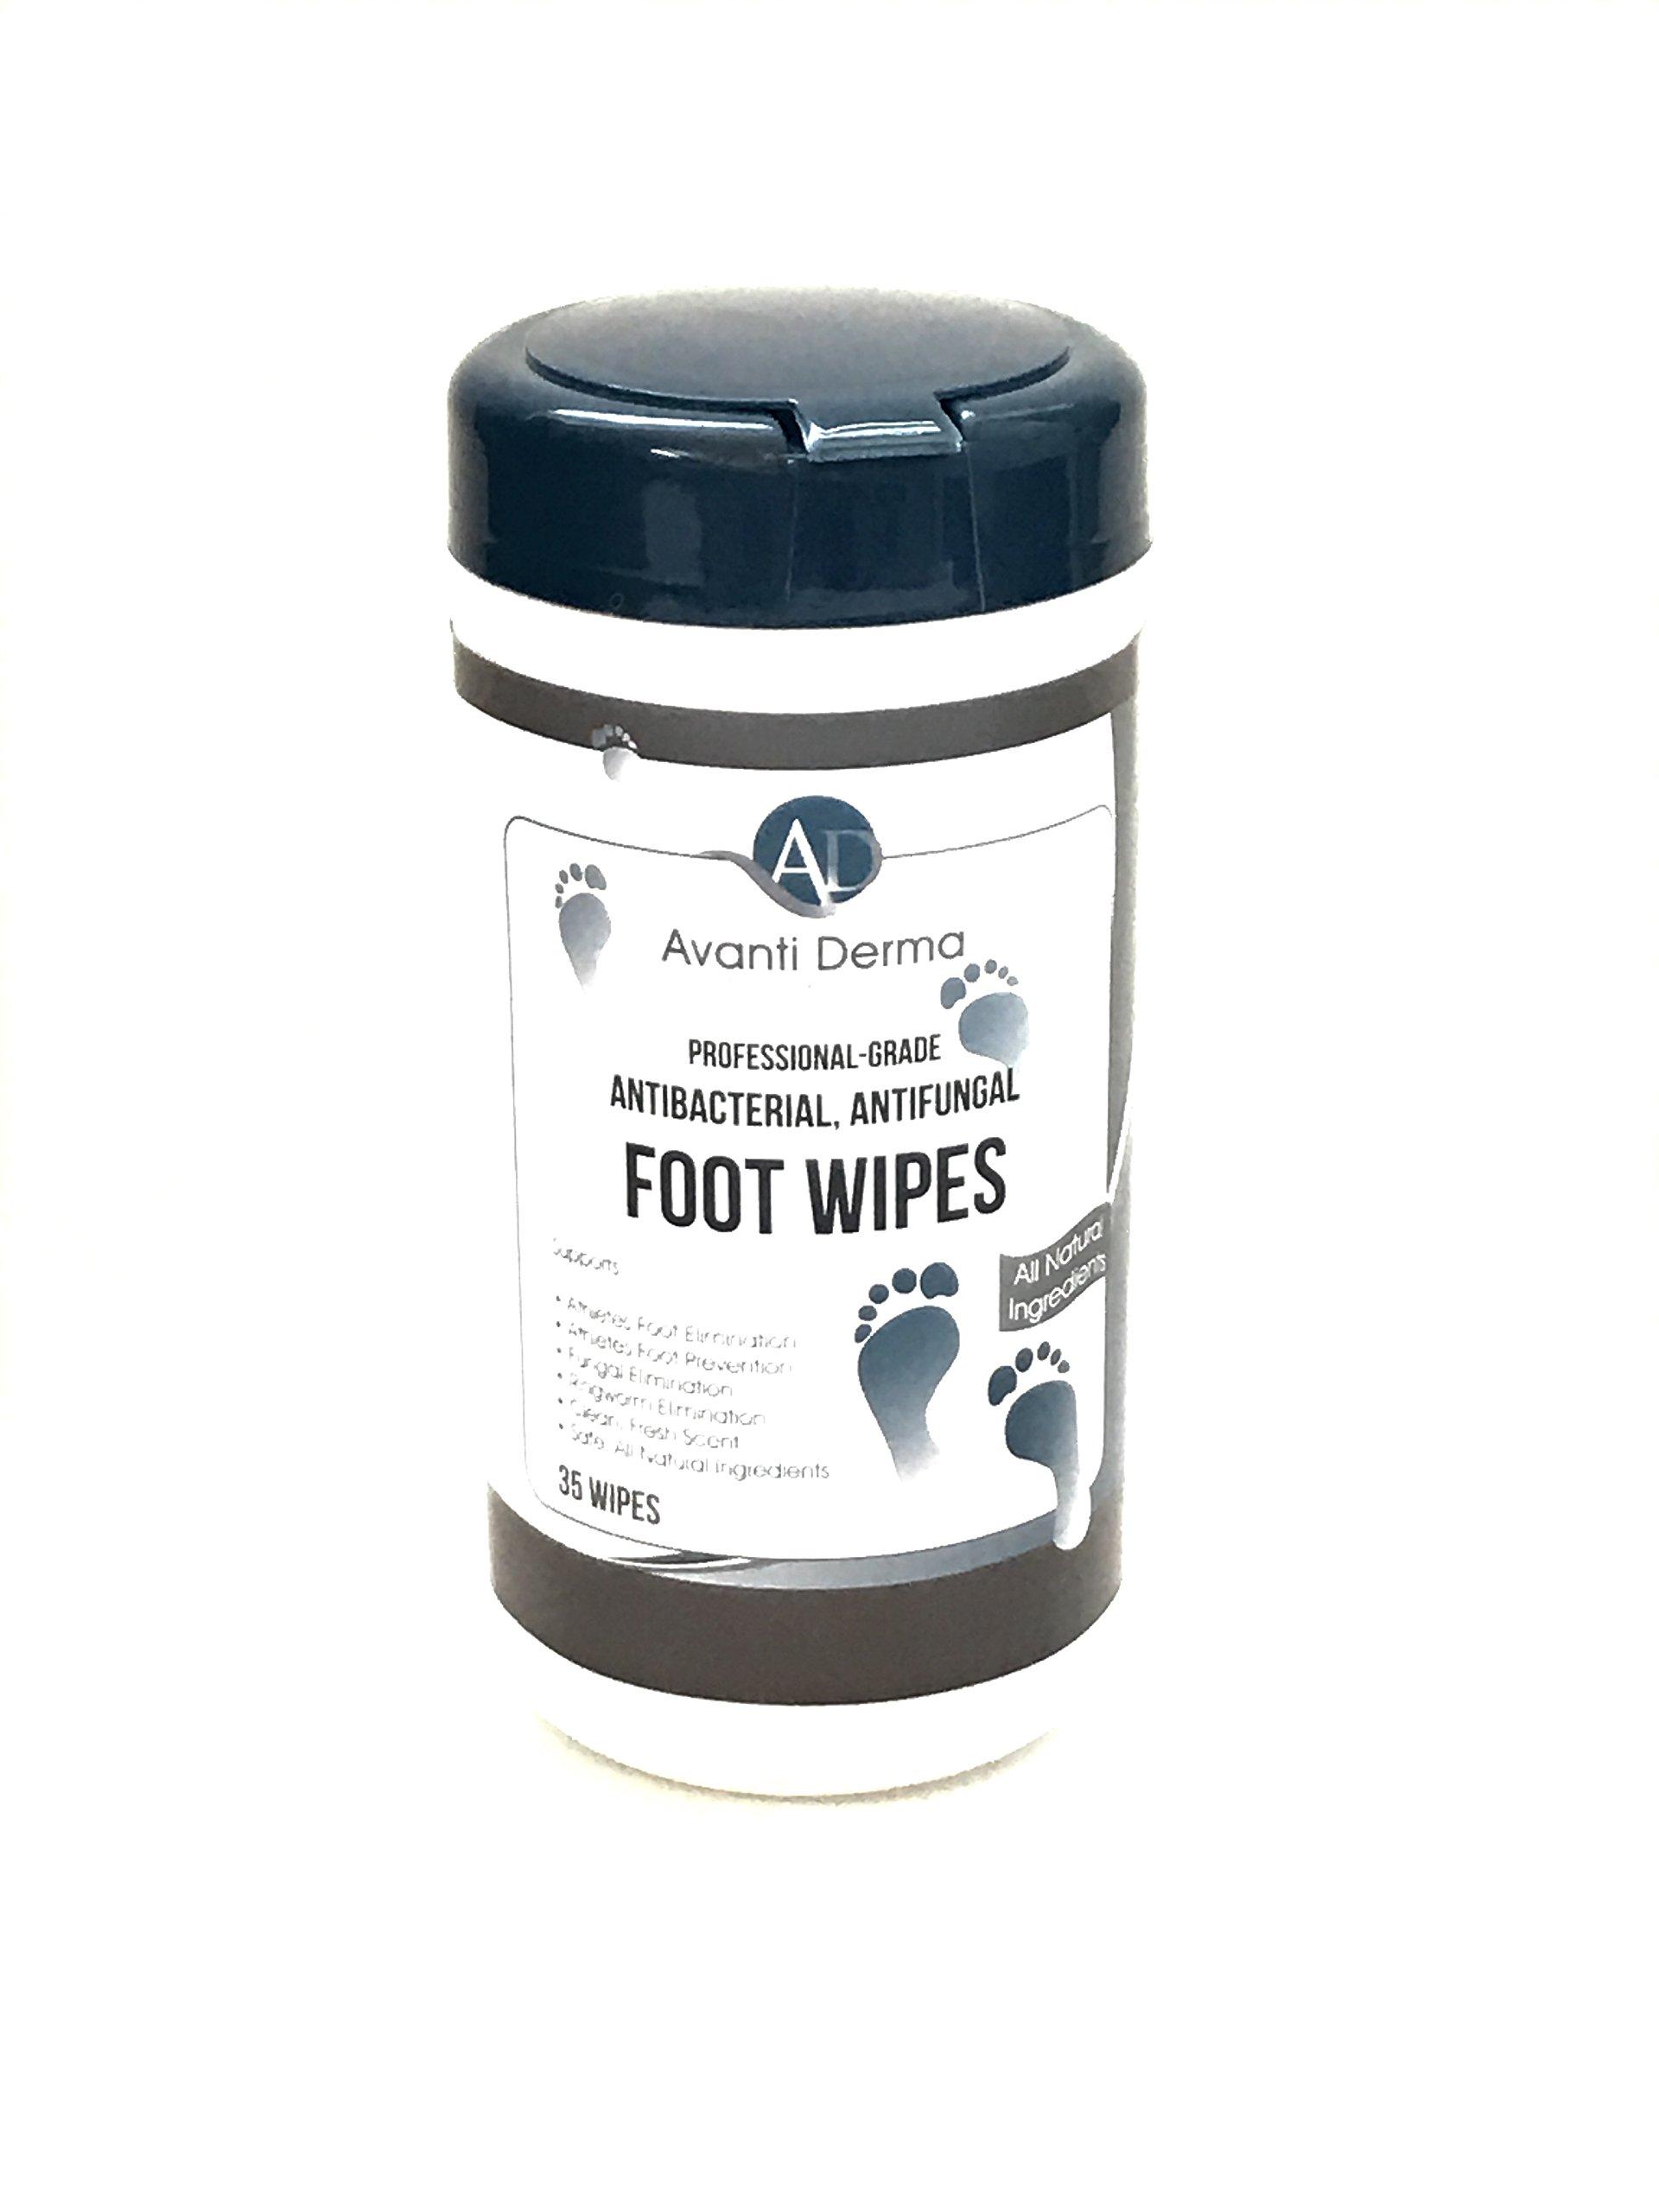 Avanti Derma Professional-Grade Antibacterial, Antifungal Foot Wipes